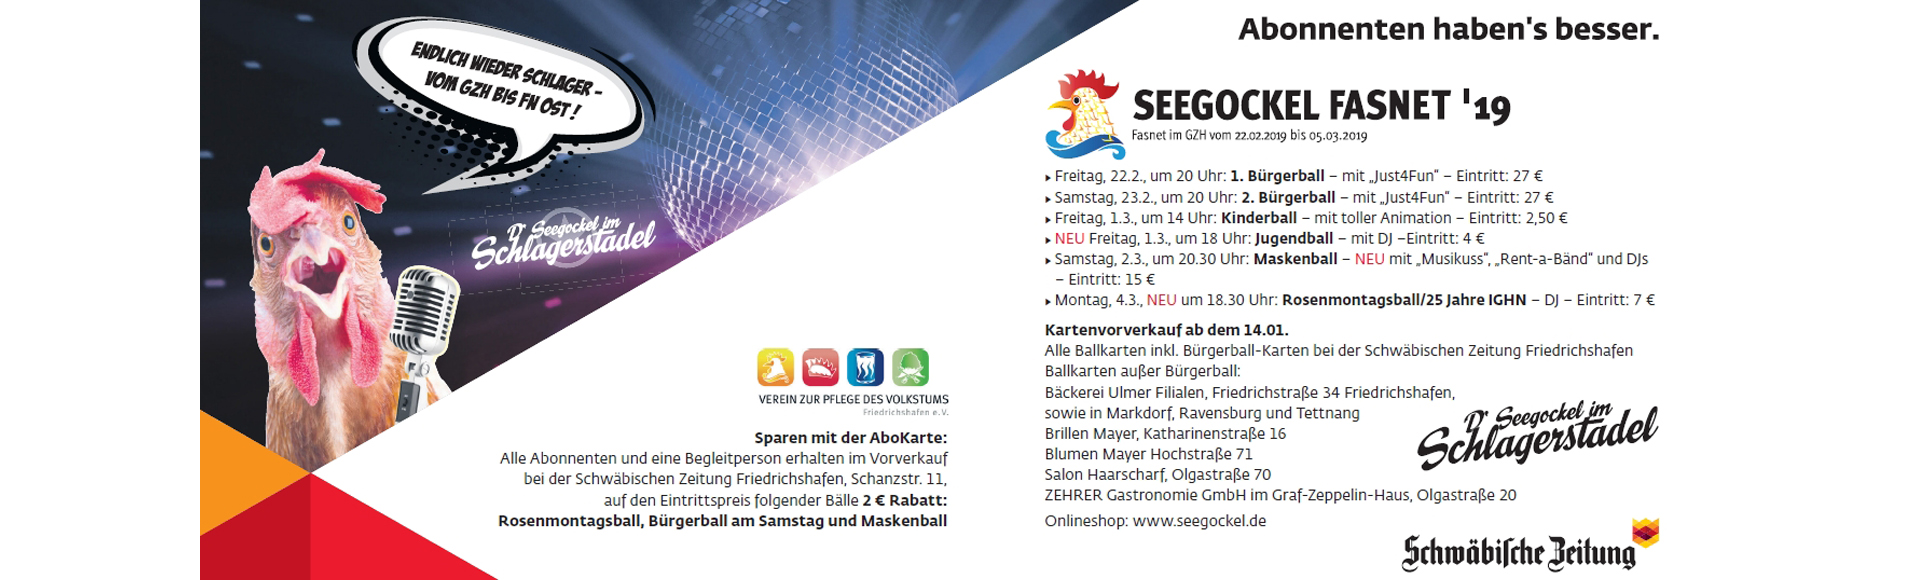 Seegockelfasnet 2019